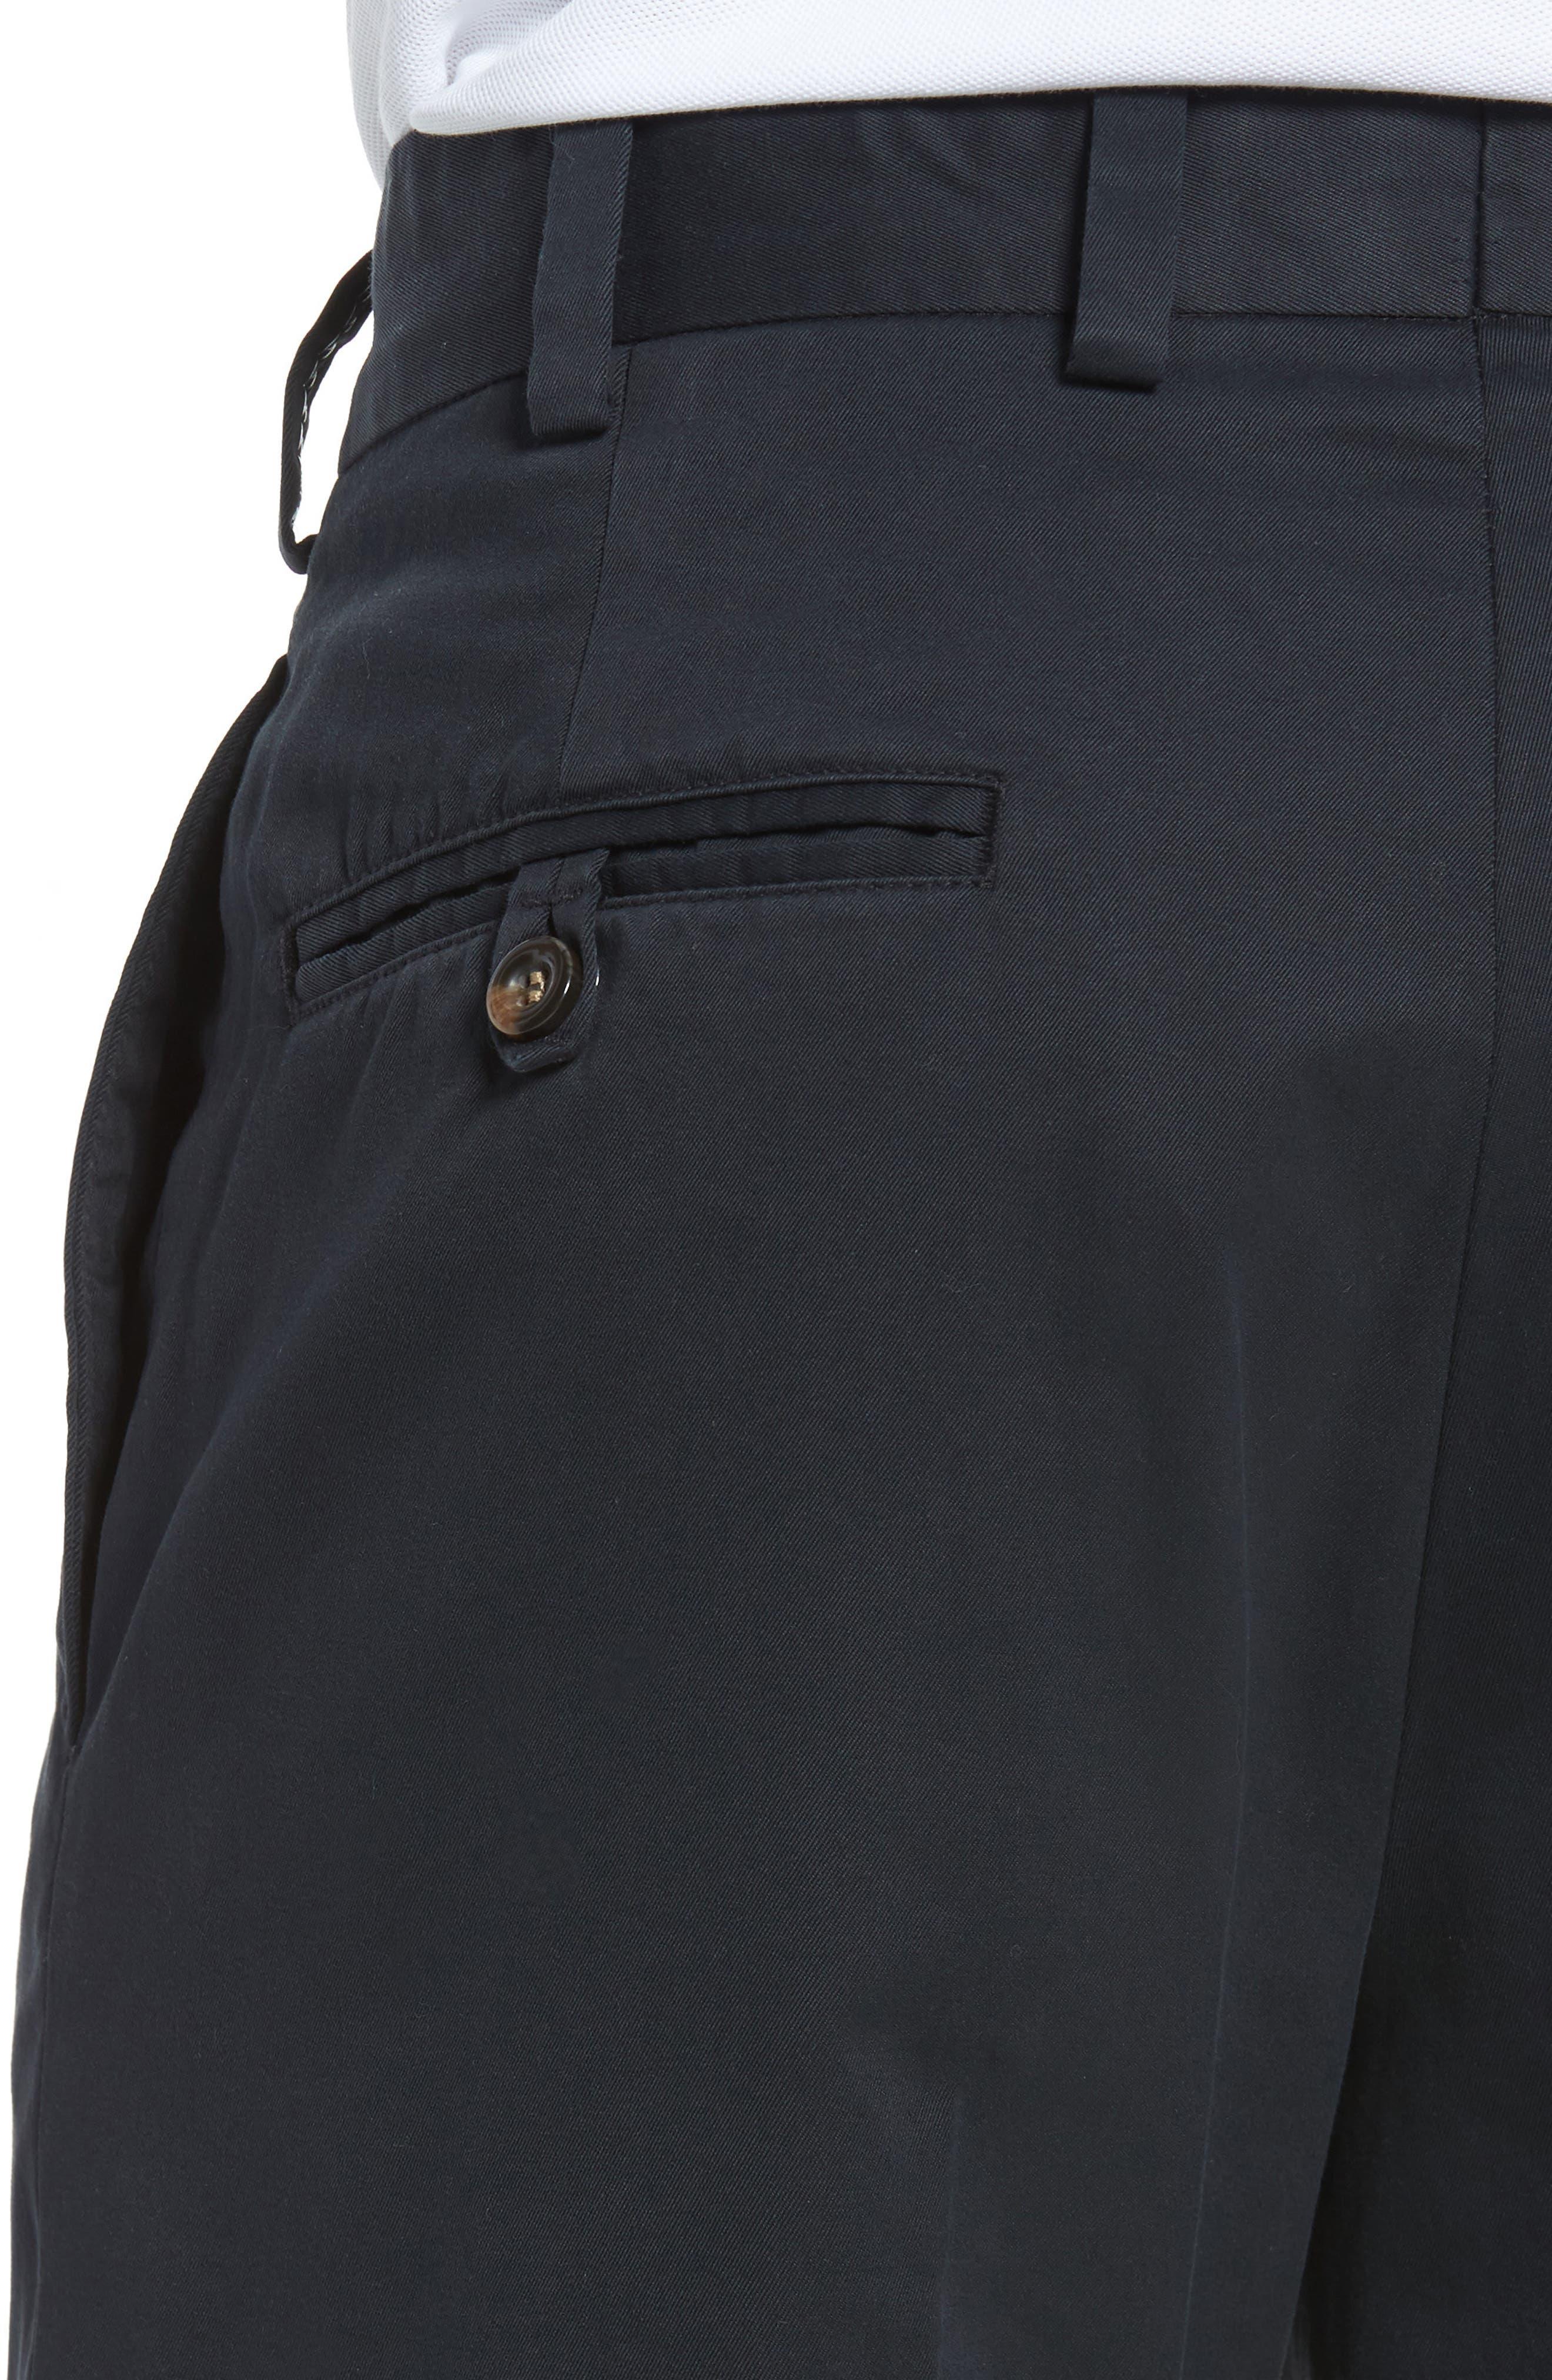 Classic Fit Chamois Cloth Pants,                             Alternate thumbnail 4, color,                             Black